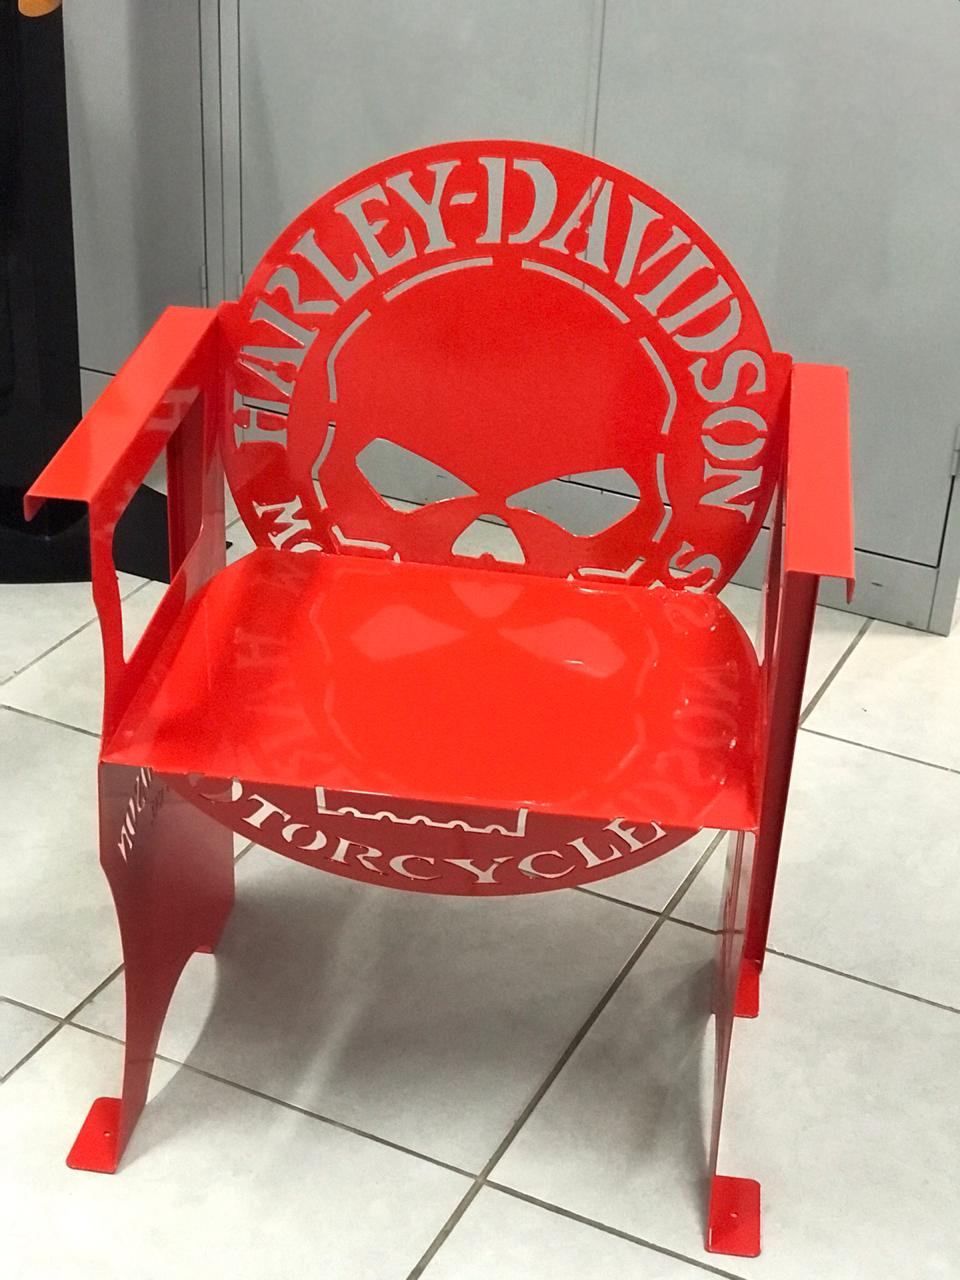 Poltrona SKULL Harley-Davidson 0,65 m Vermelha  - HDC Brasil